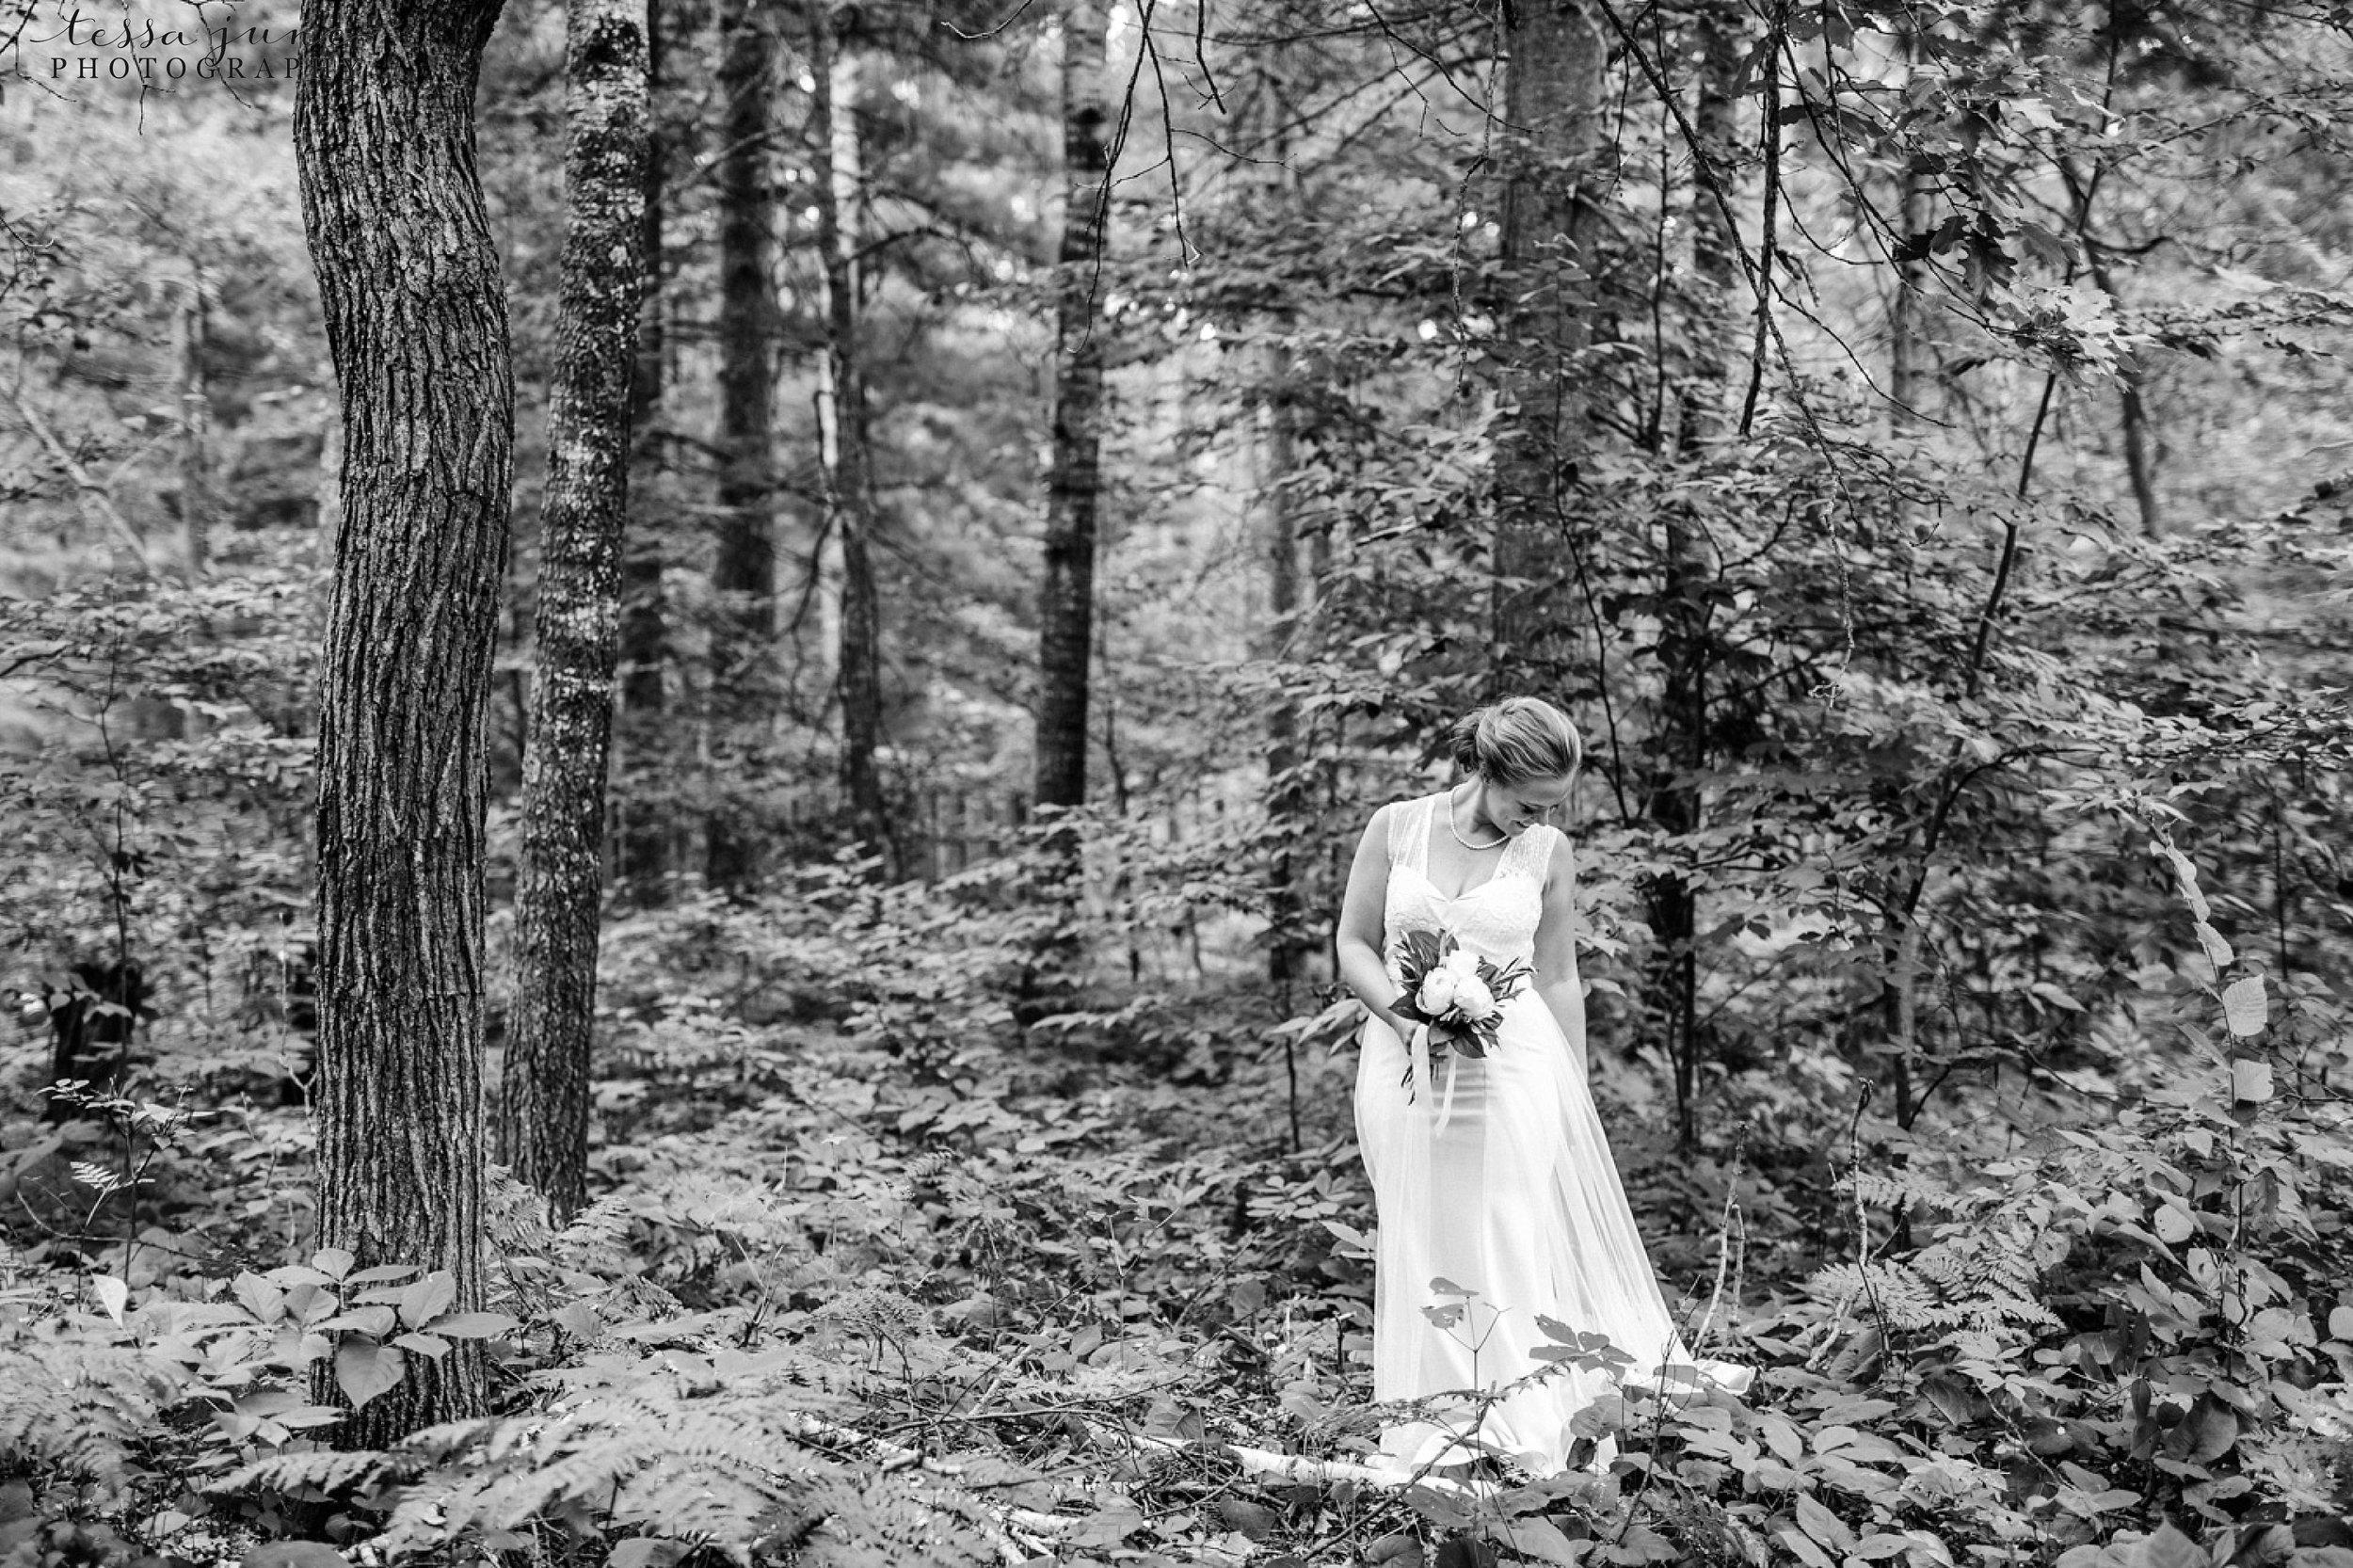 grandview-lodge-intimate-wedding-nisswa-minnesota_0034.jpg